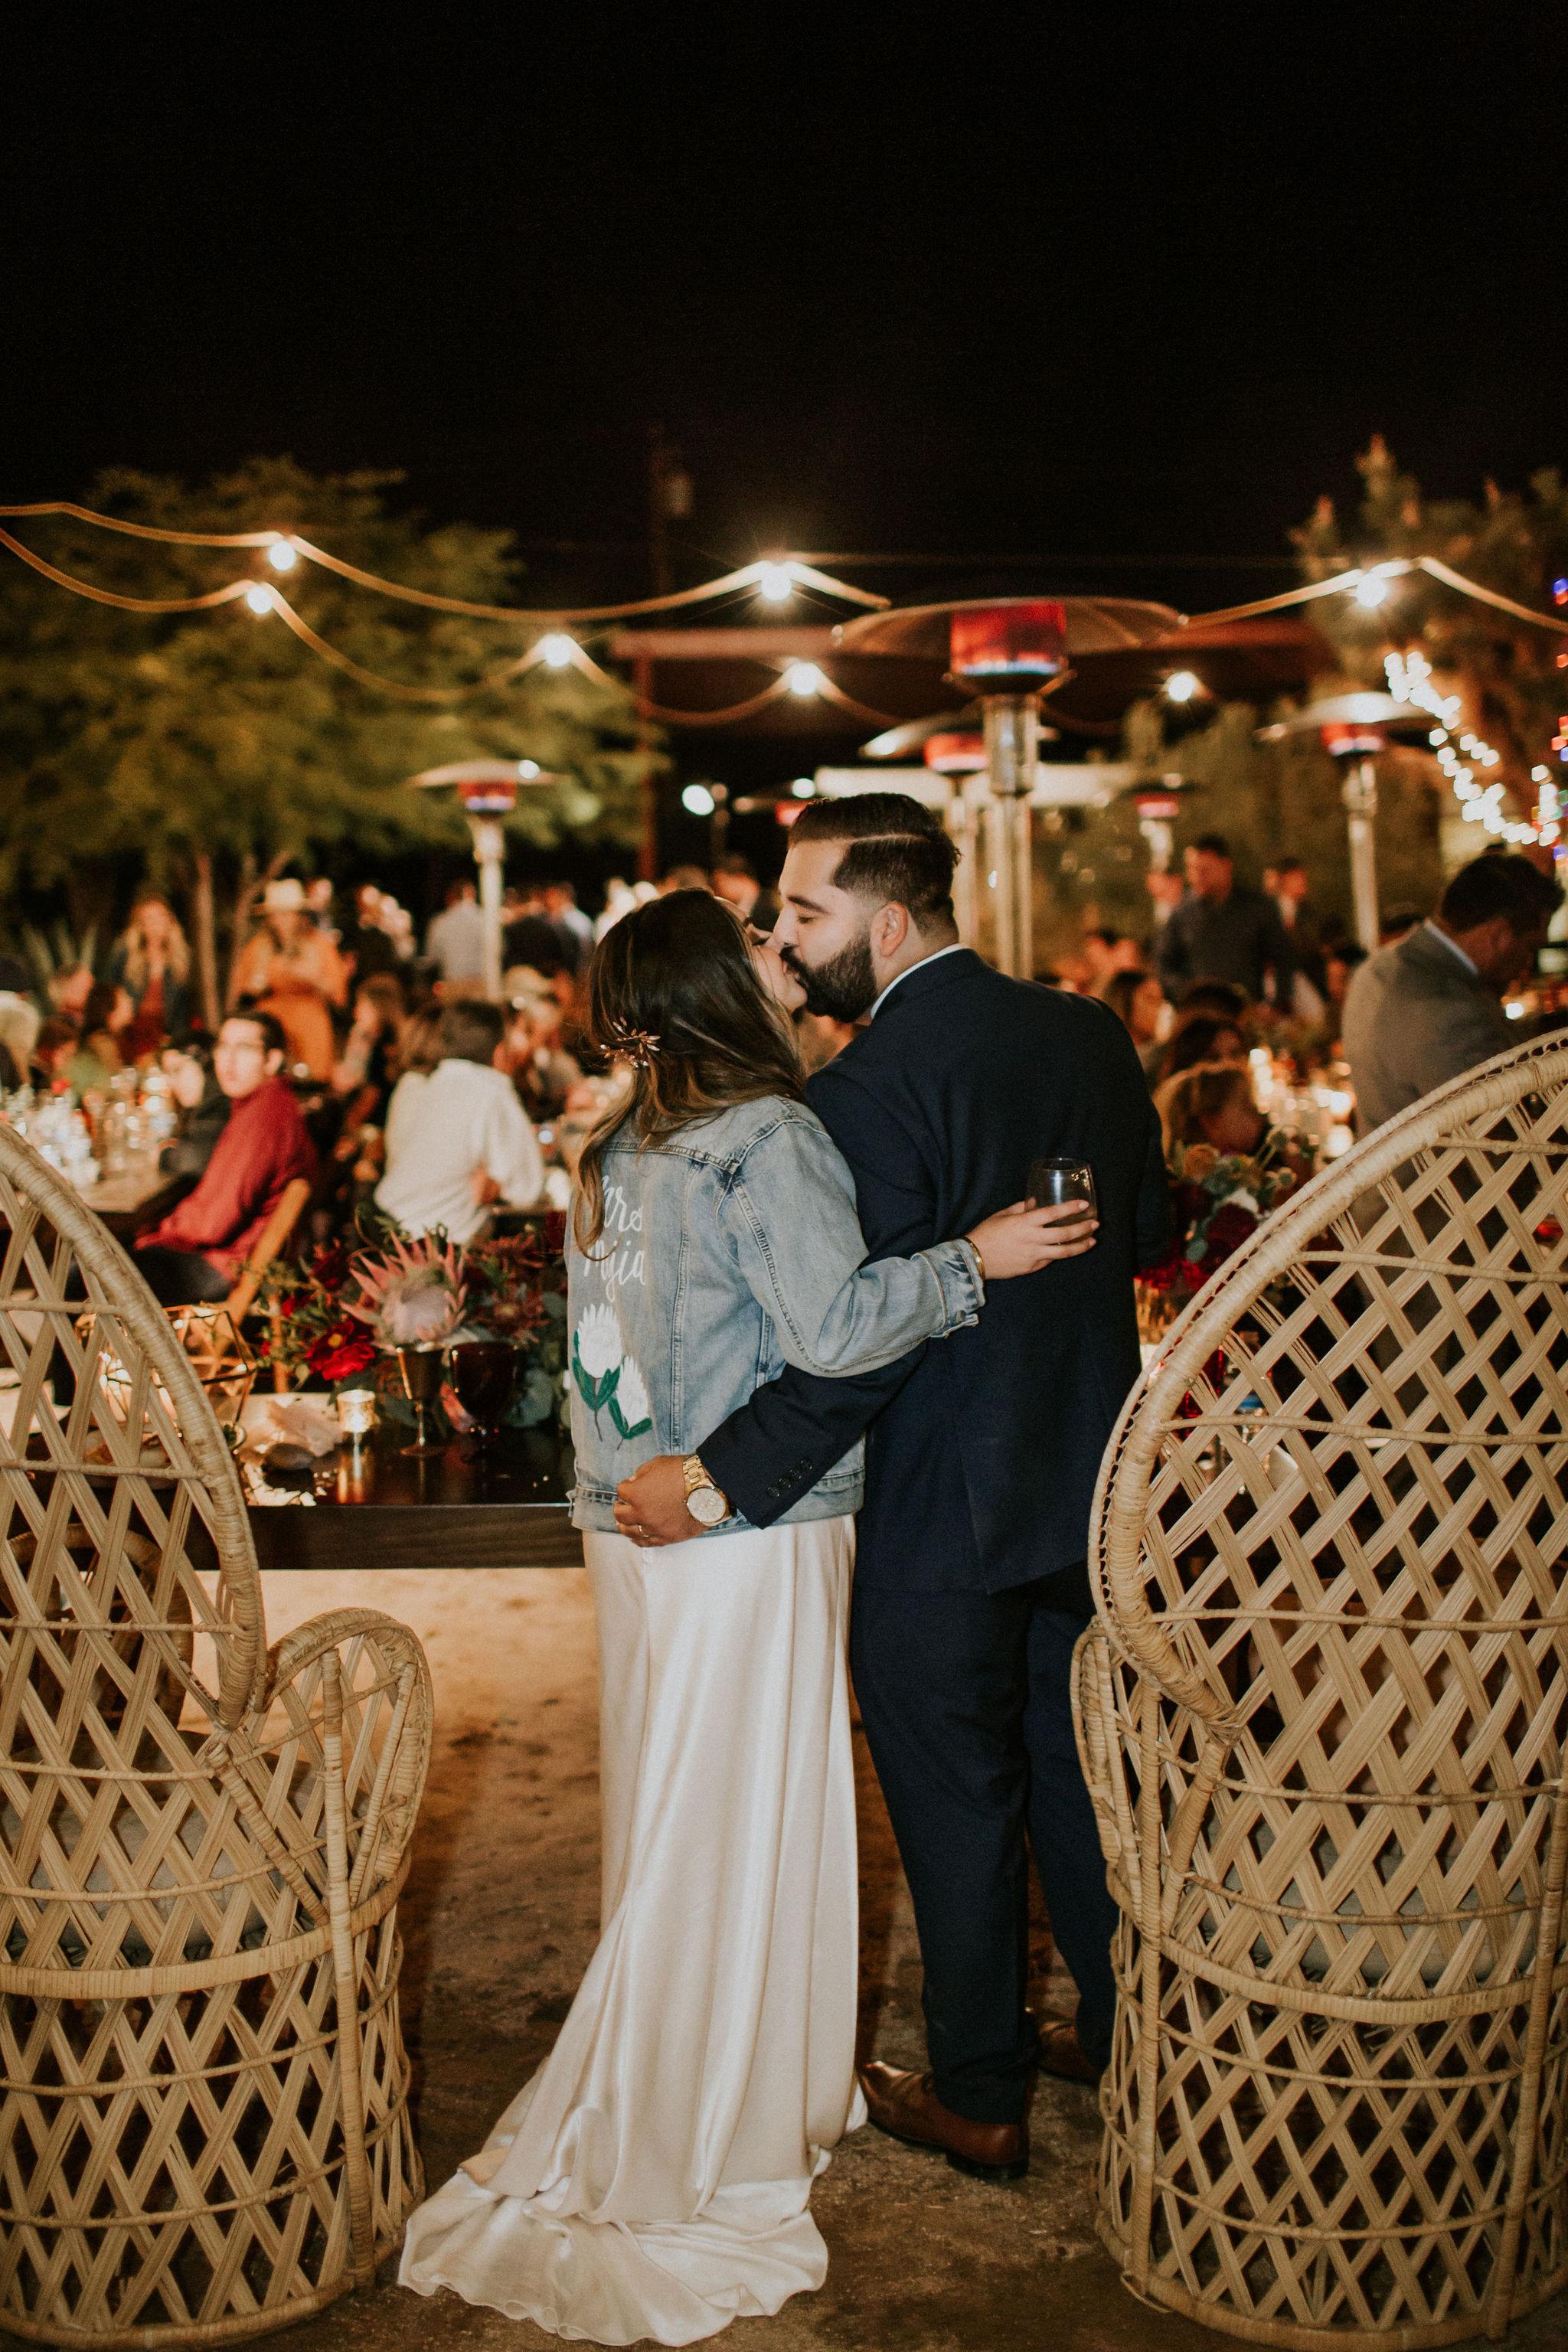 RimrockRanch-JoshuaTree-Wedding-Jami-Laree-974.jpg